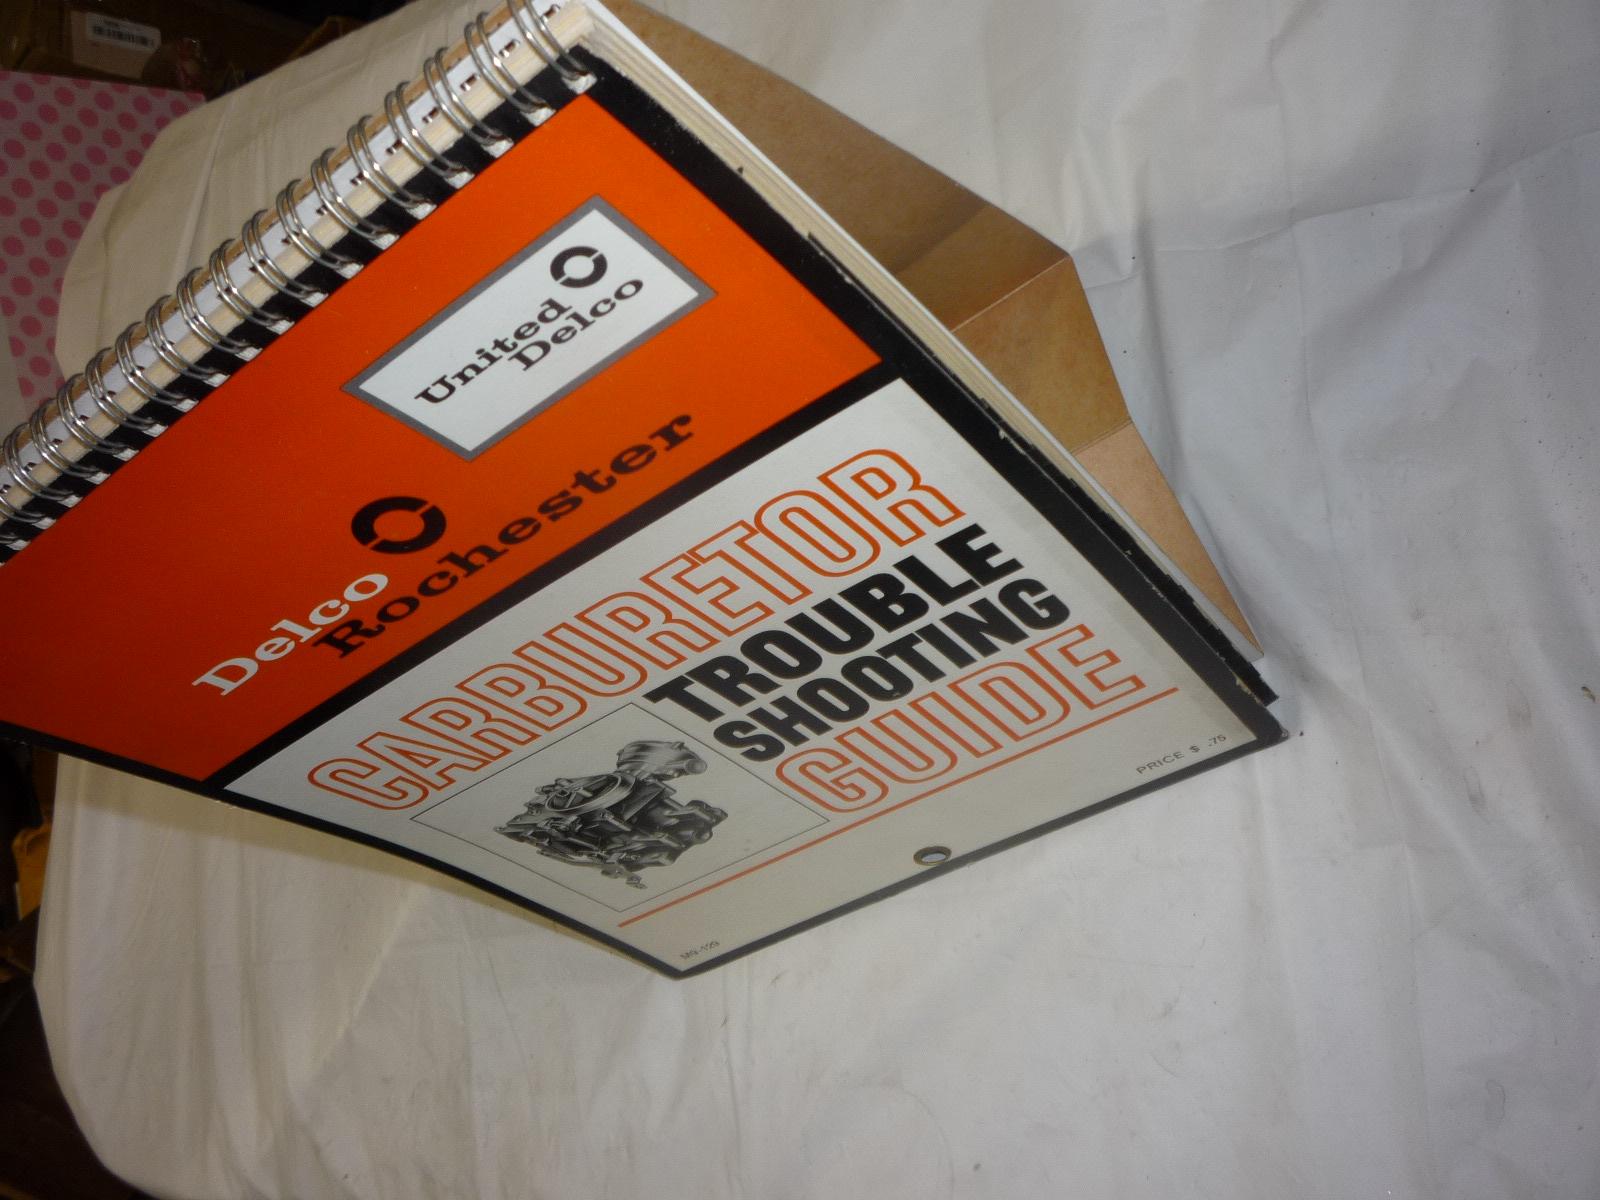 vintage 60s Delco carburetor troubleshooting guide standup display